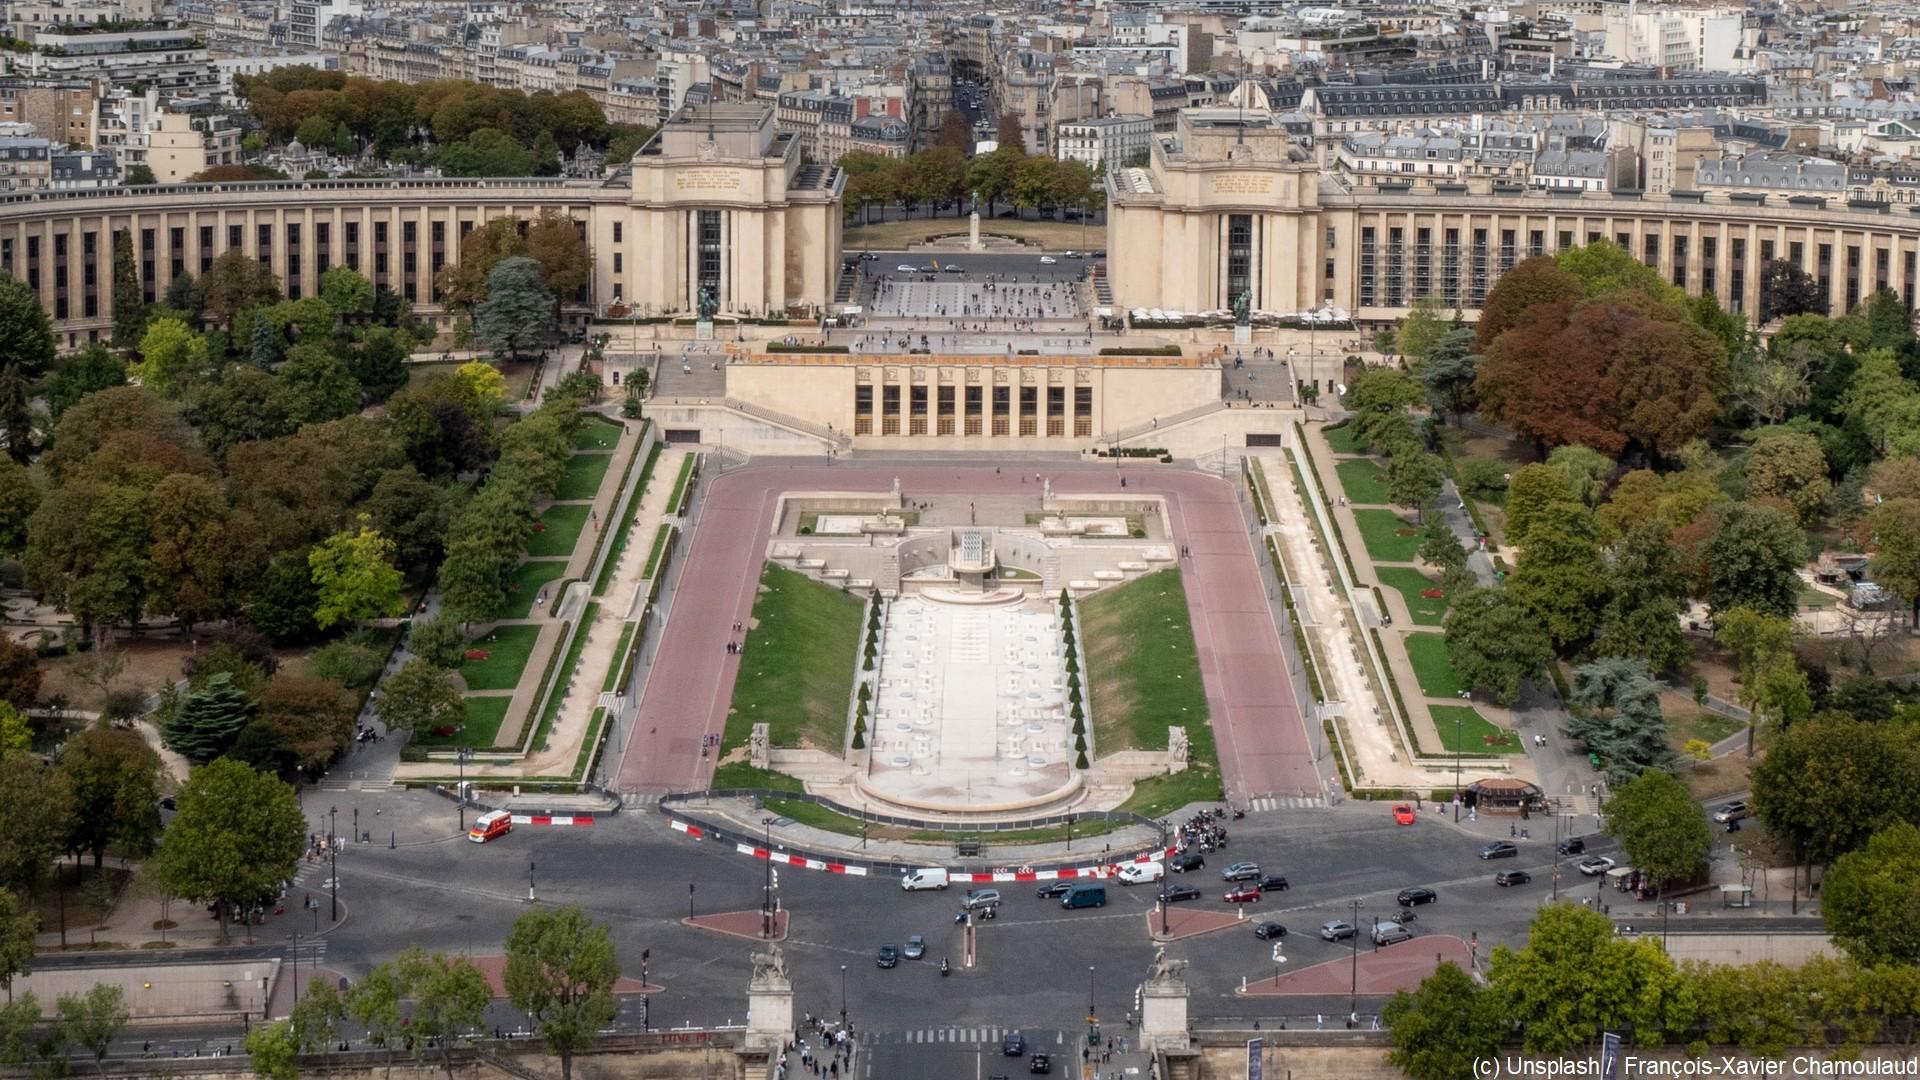 Paris – Trocadéro (c) Unsplash François-Xavier Chamoulaud